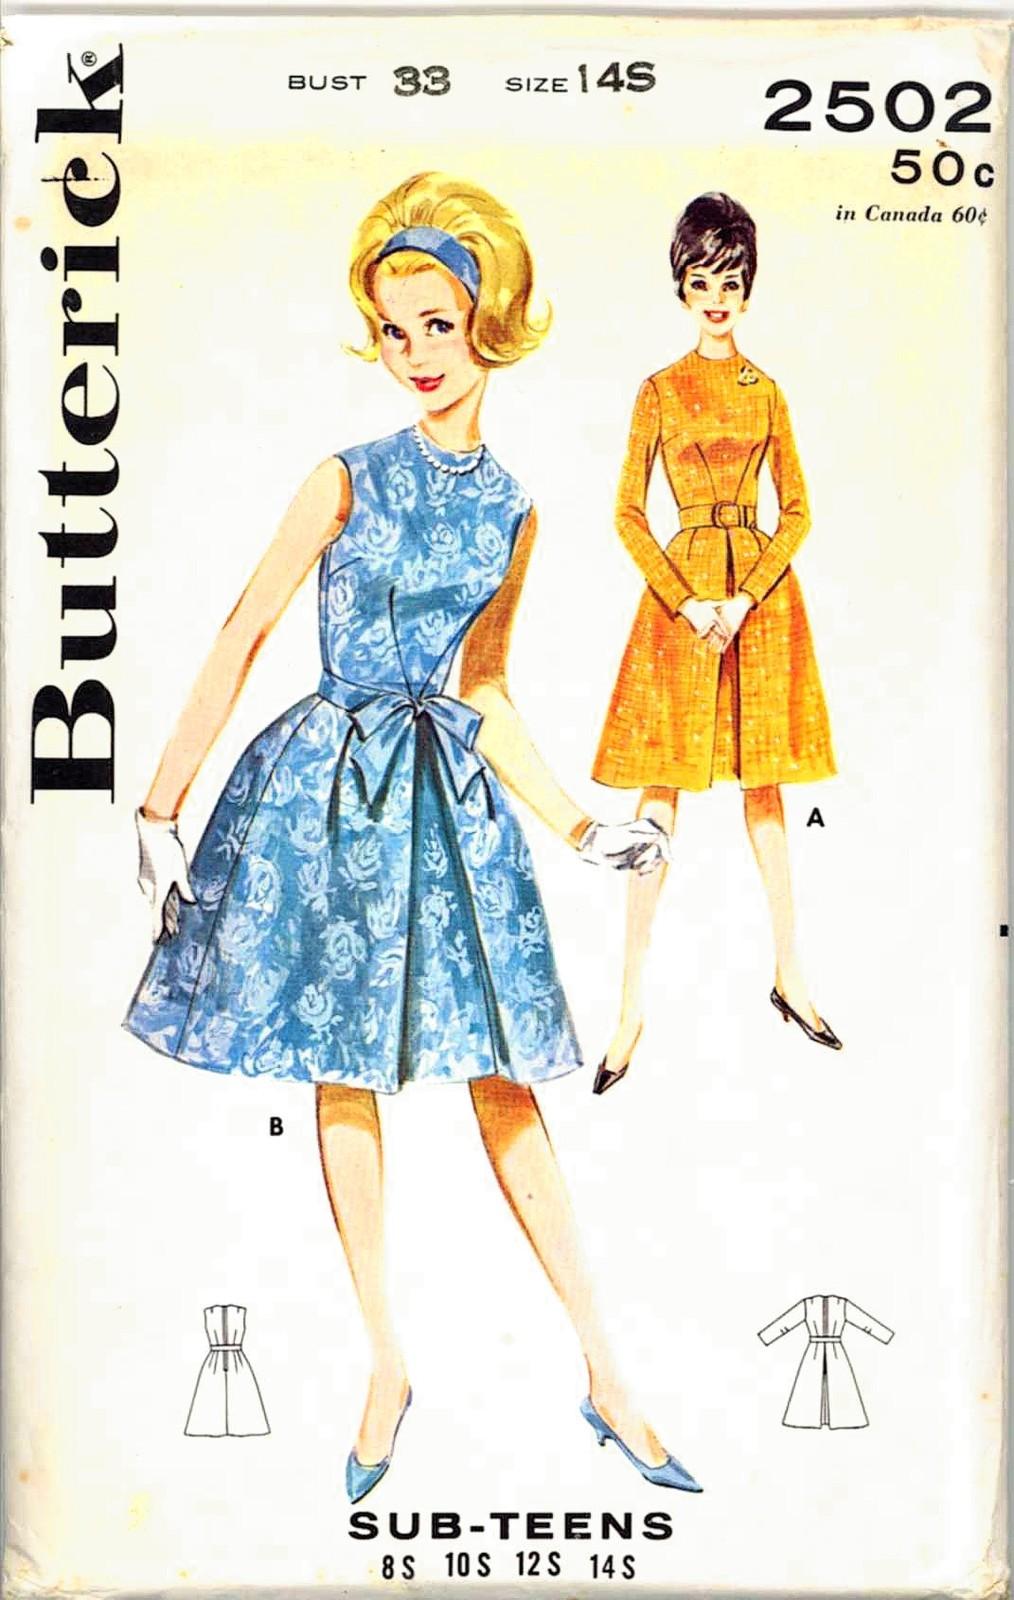 Store 81 b 2502 blue dress 14s 1961 unc